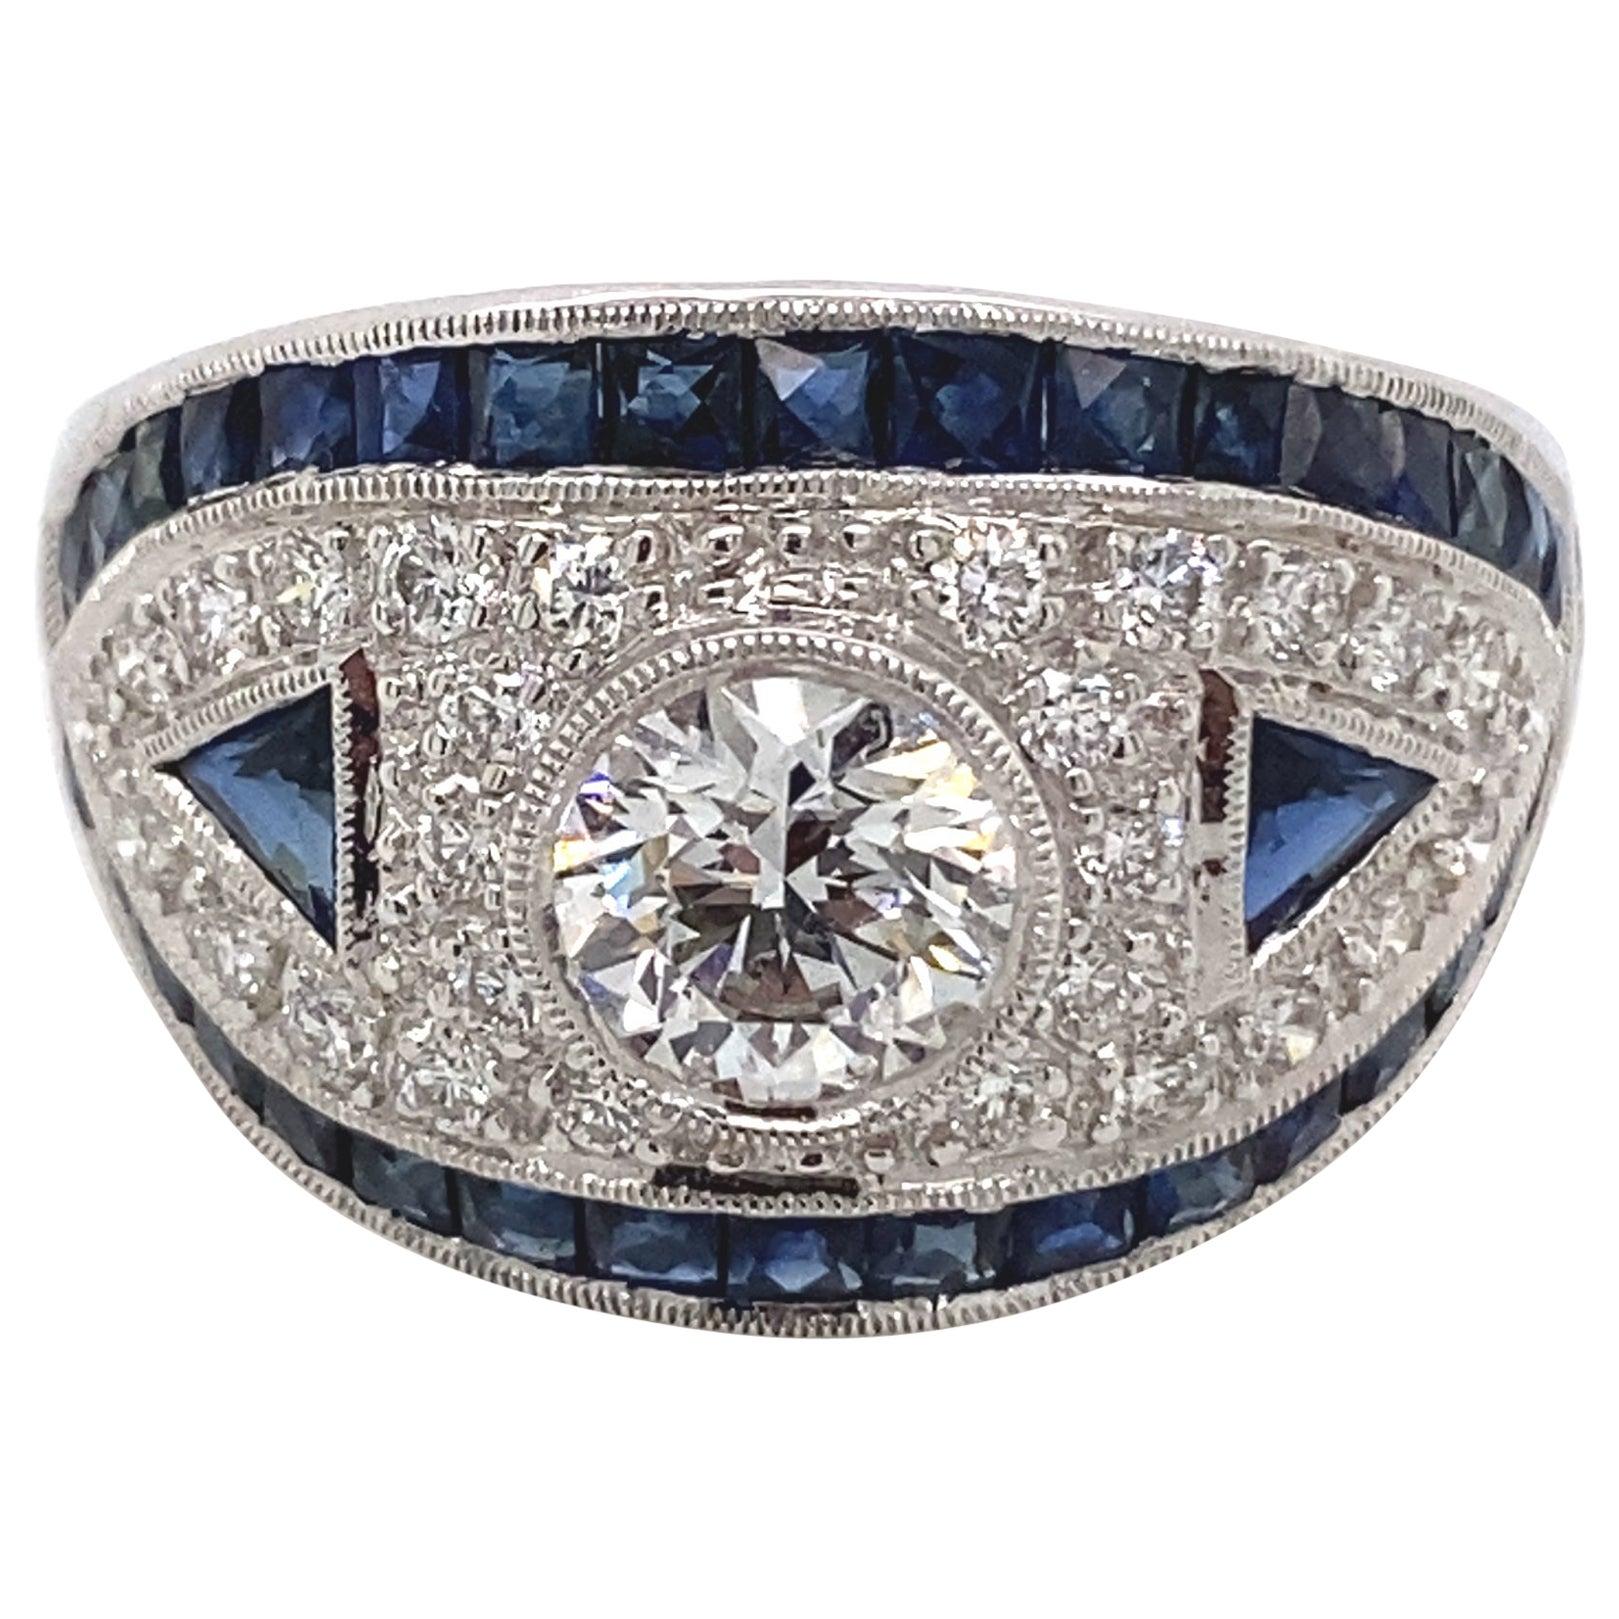 Art Deco Inspired Diamond with Sapphire Ring 18 Karat White Gold